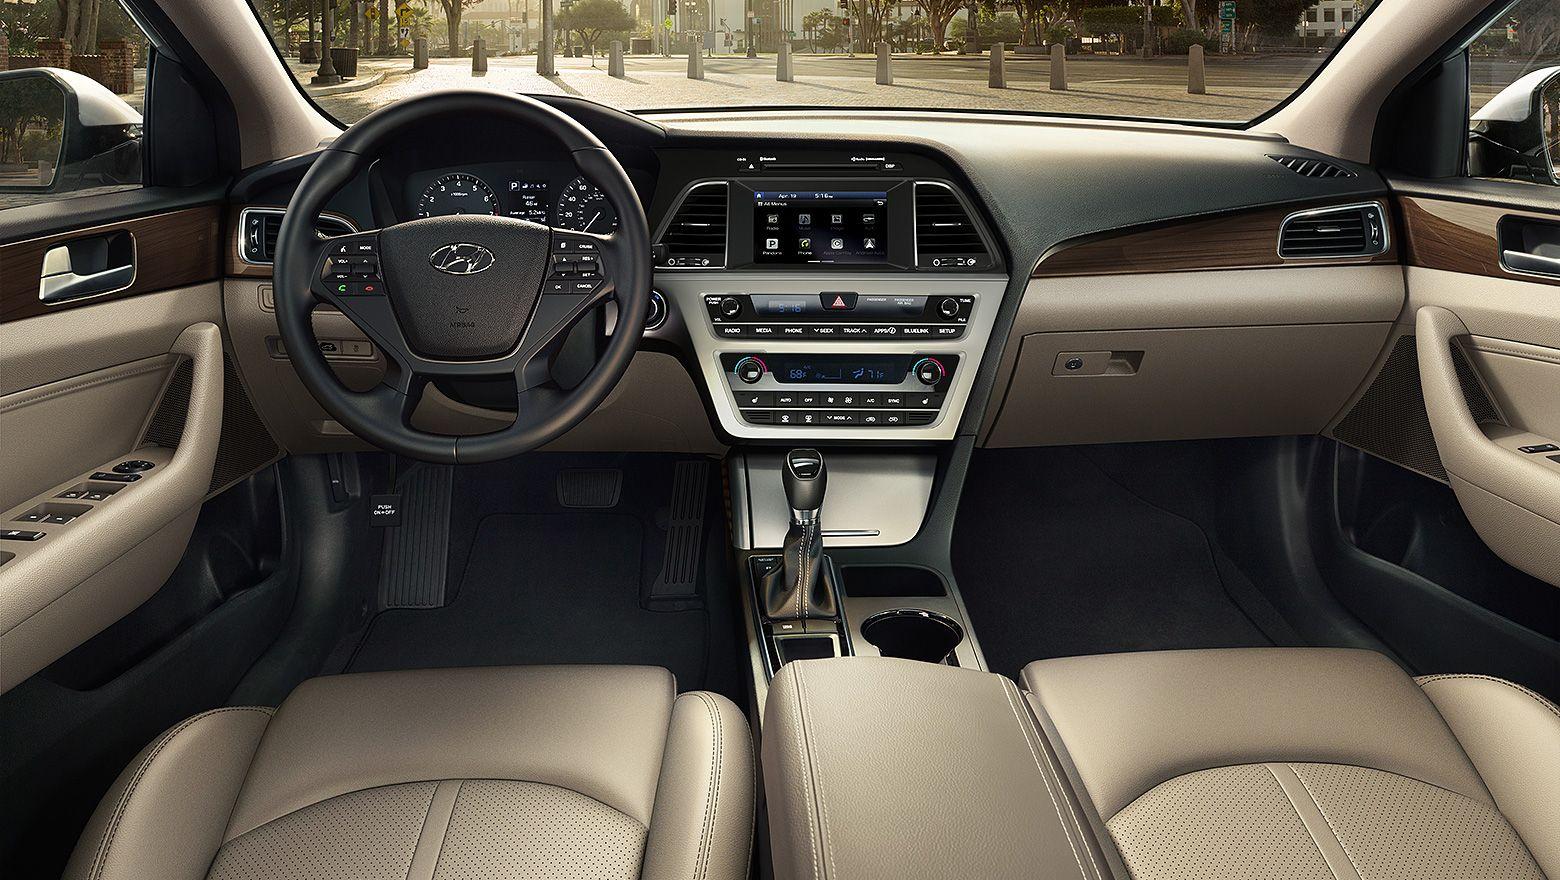 Build Your Own Hyundai Usa 2017 Sonata Limited Nouveau Blue Beige Interior